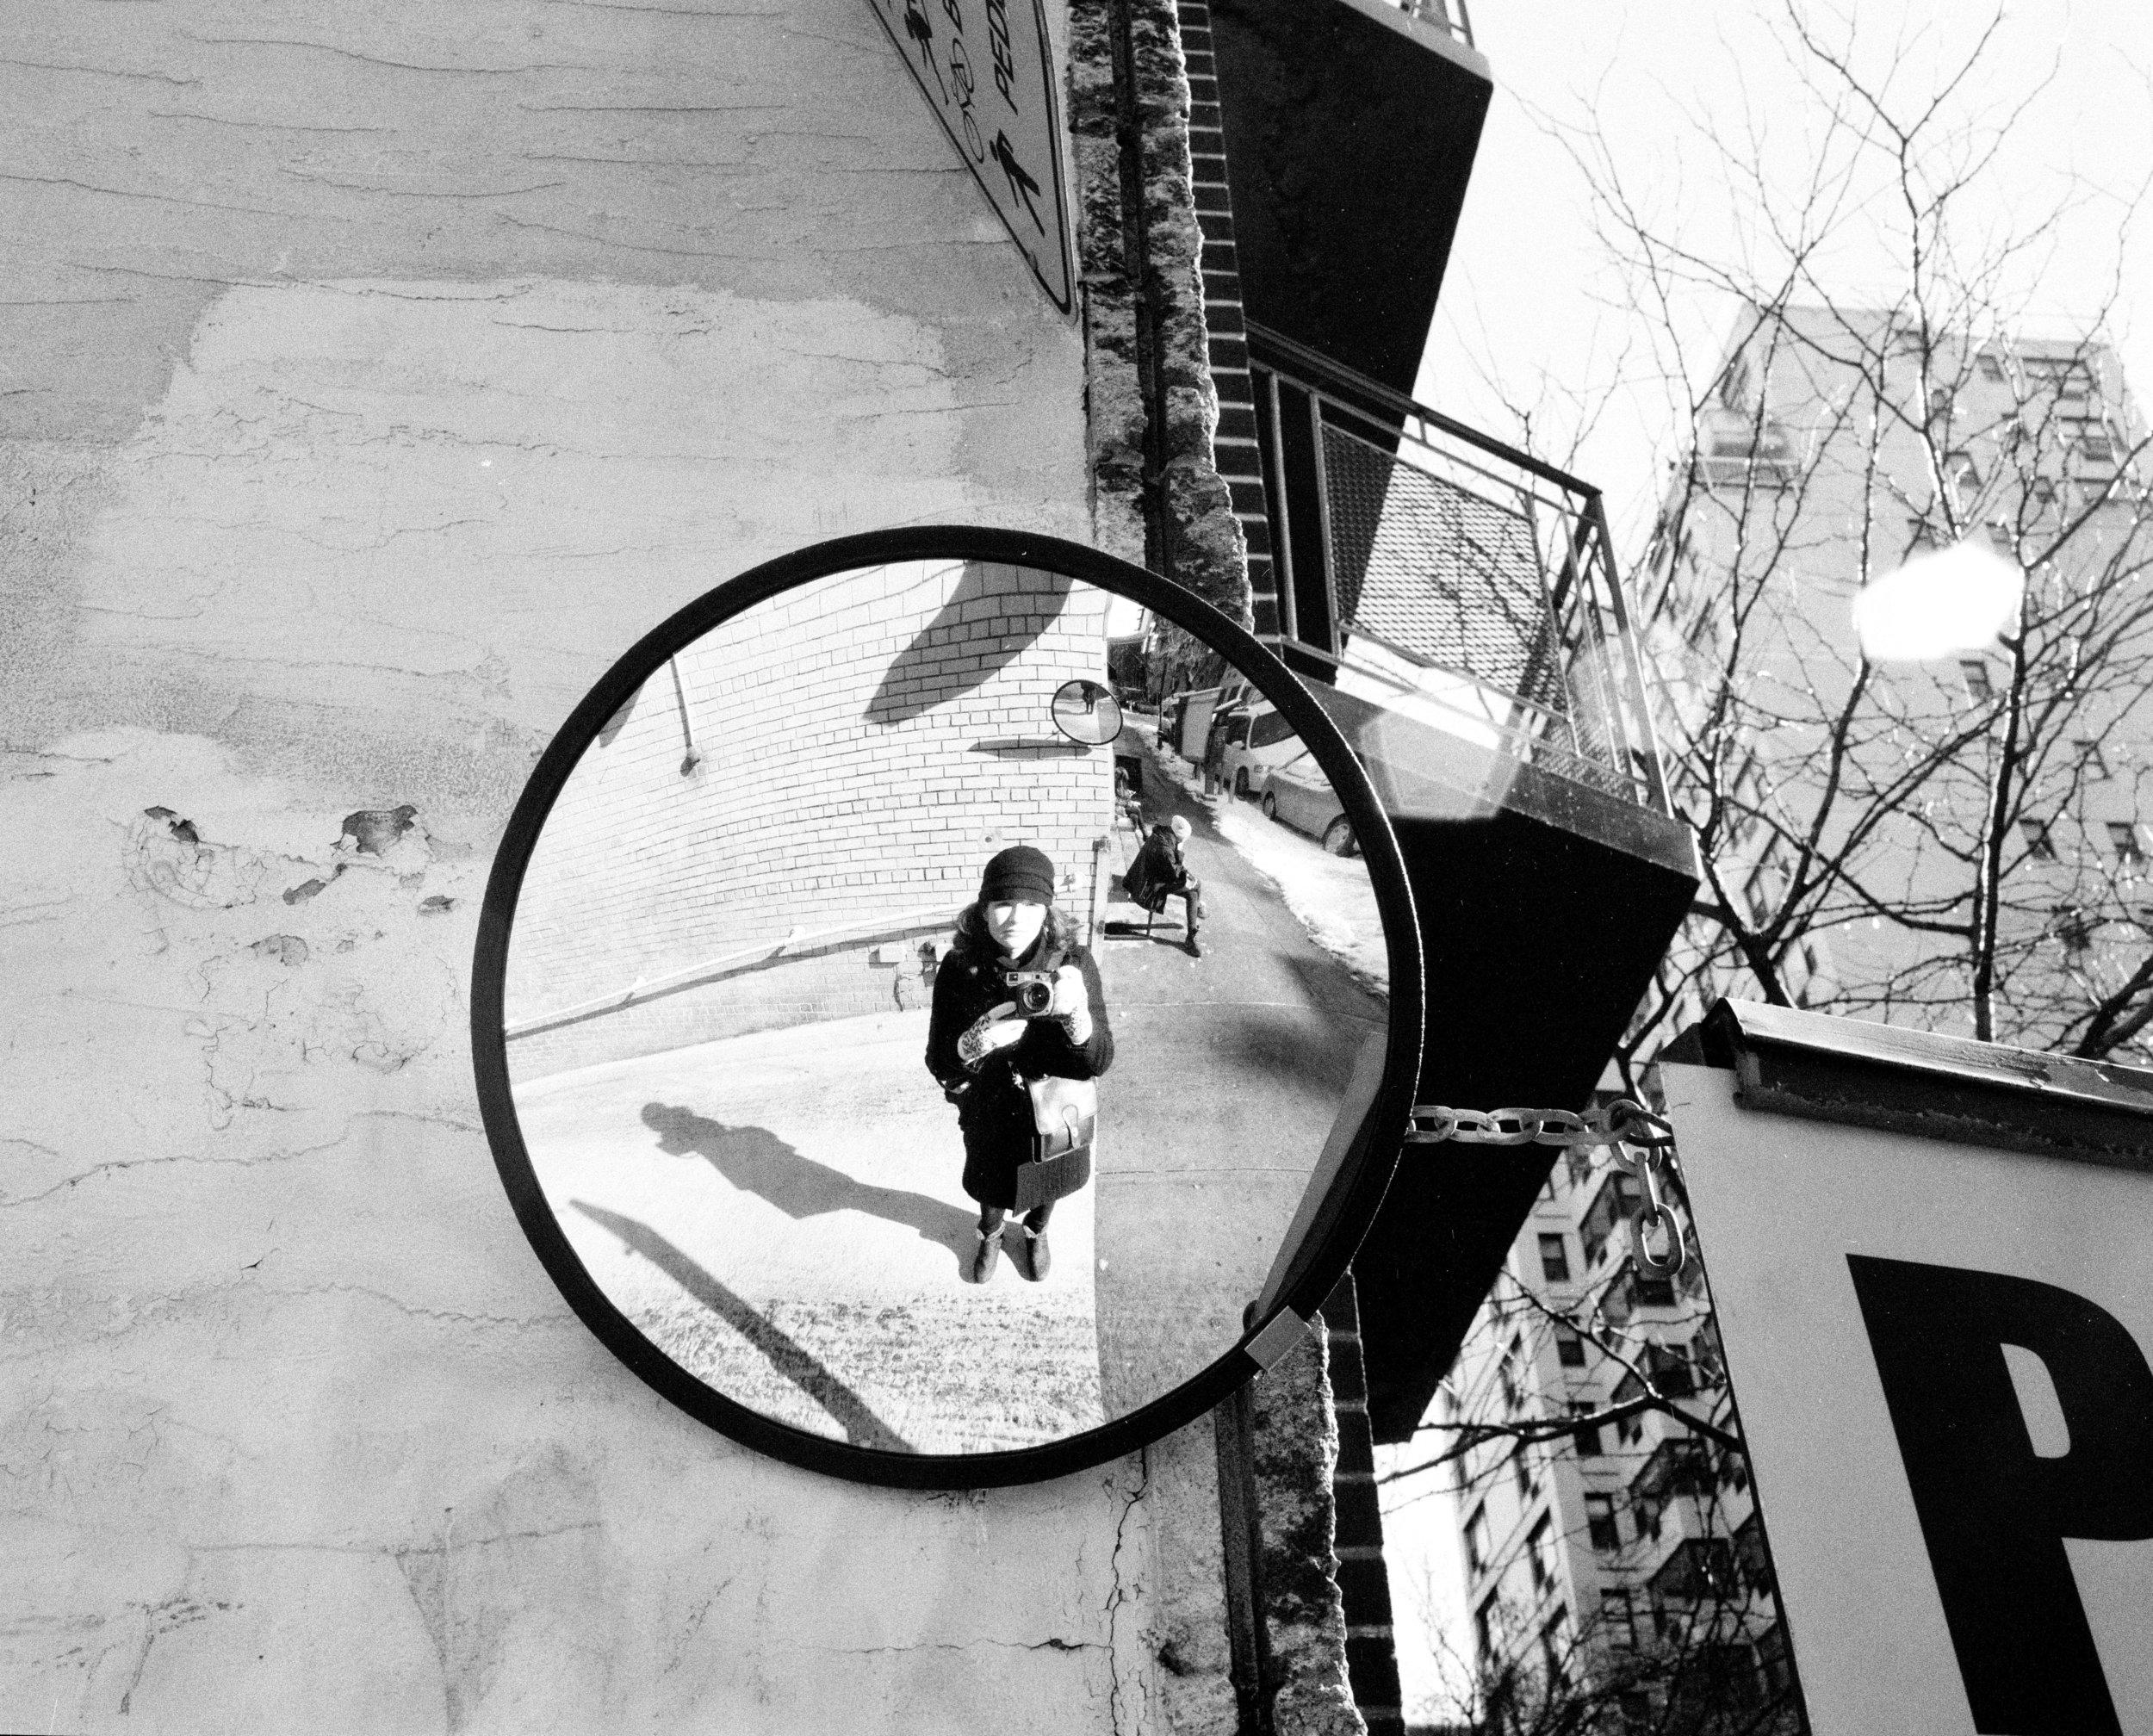 Self-Portrait on Street